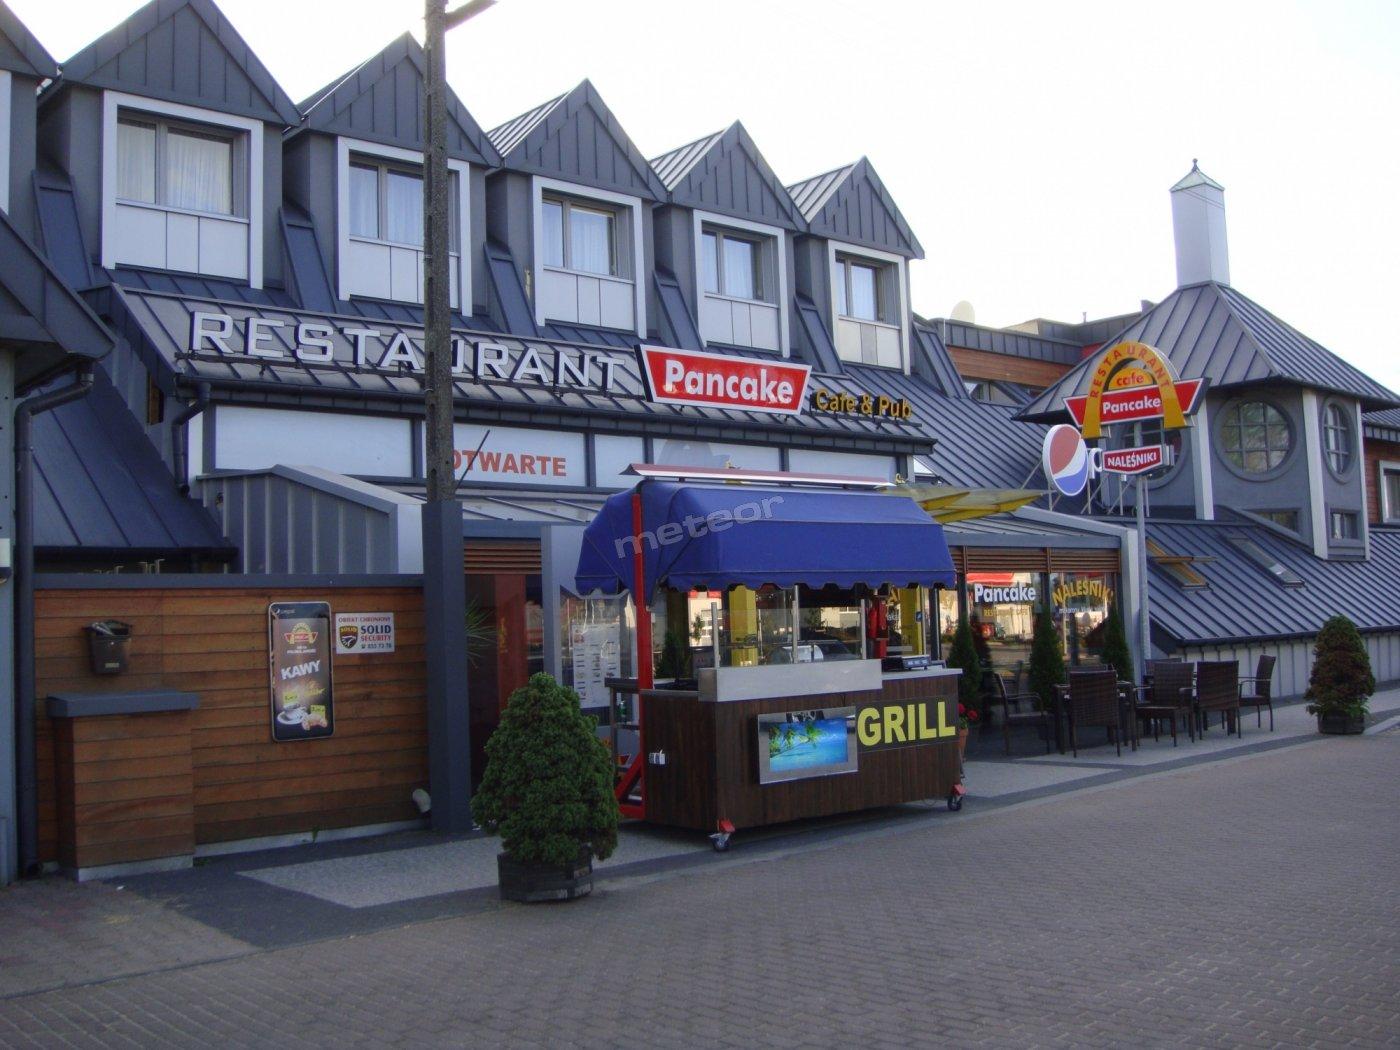 Restauracja Pancakes, Naleśnikarnia i Hotel Delicja